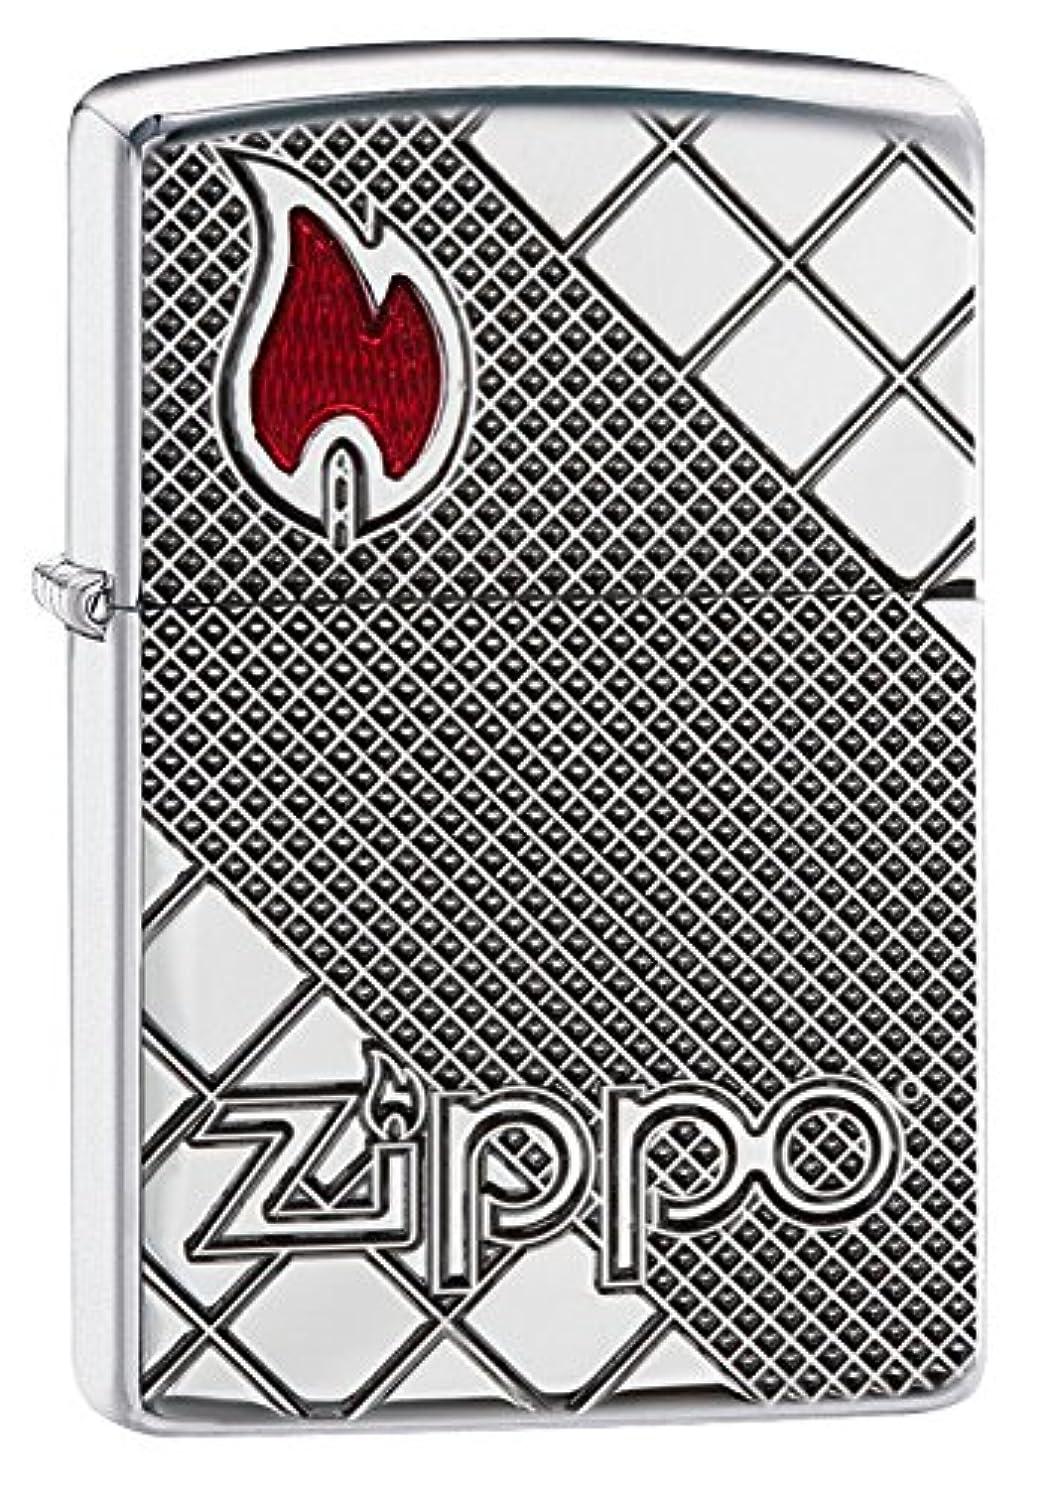 Zippo Flame Lighters